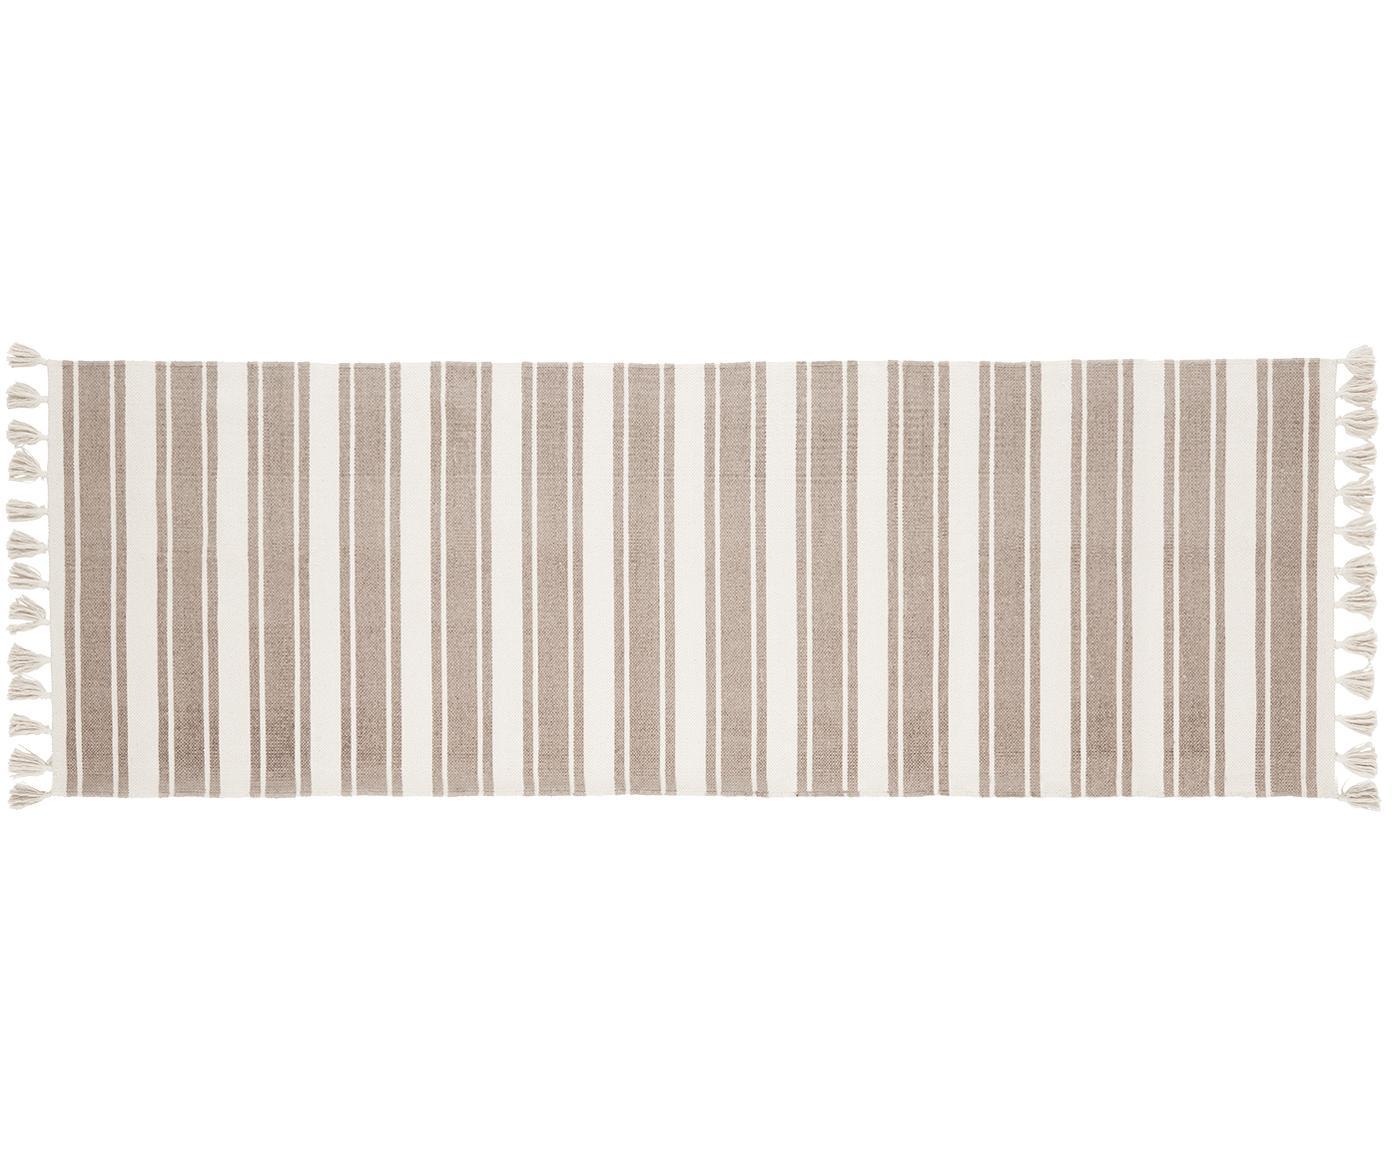 Alfombra de algodón artesanal a rayas Vigga, Gris pardo, beige, An 80 x L 250 cm